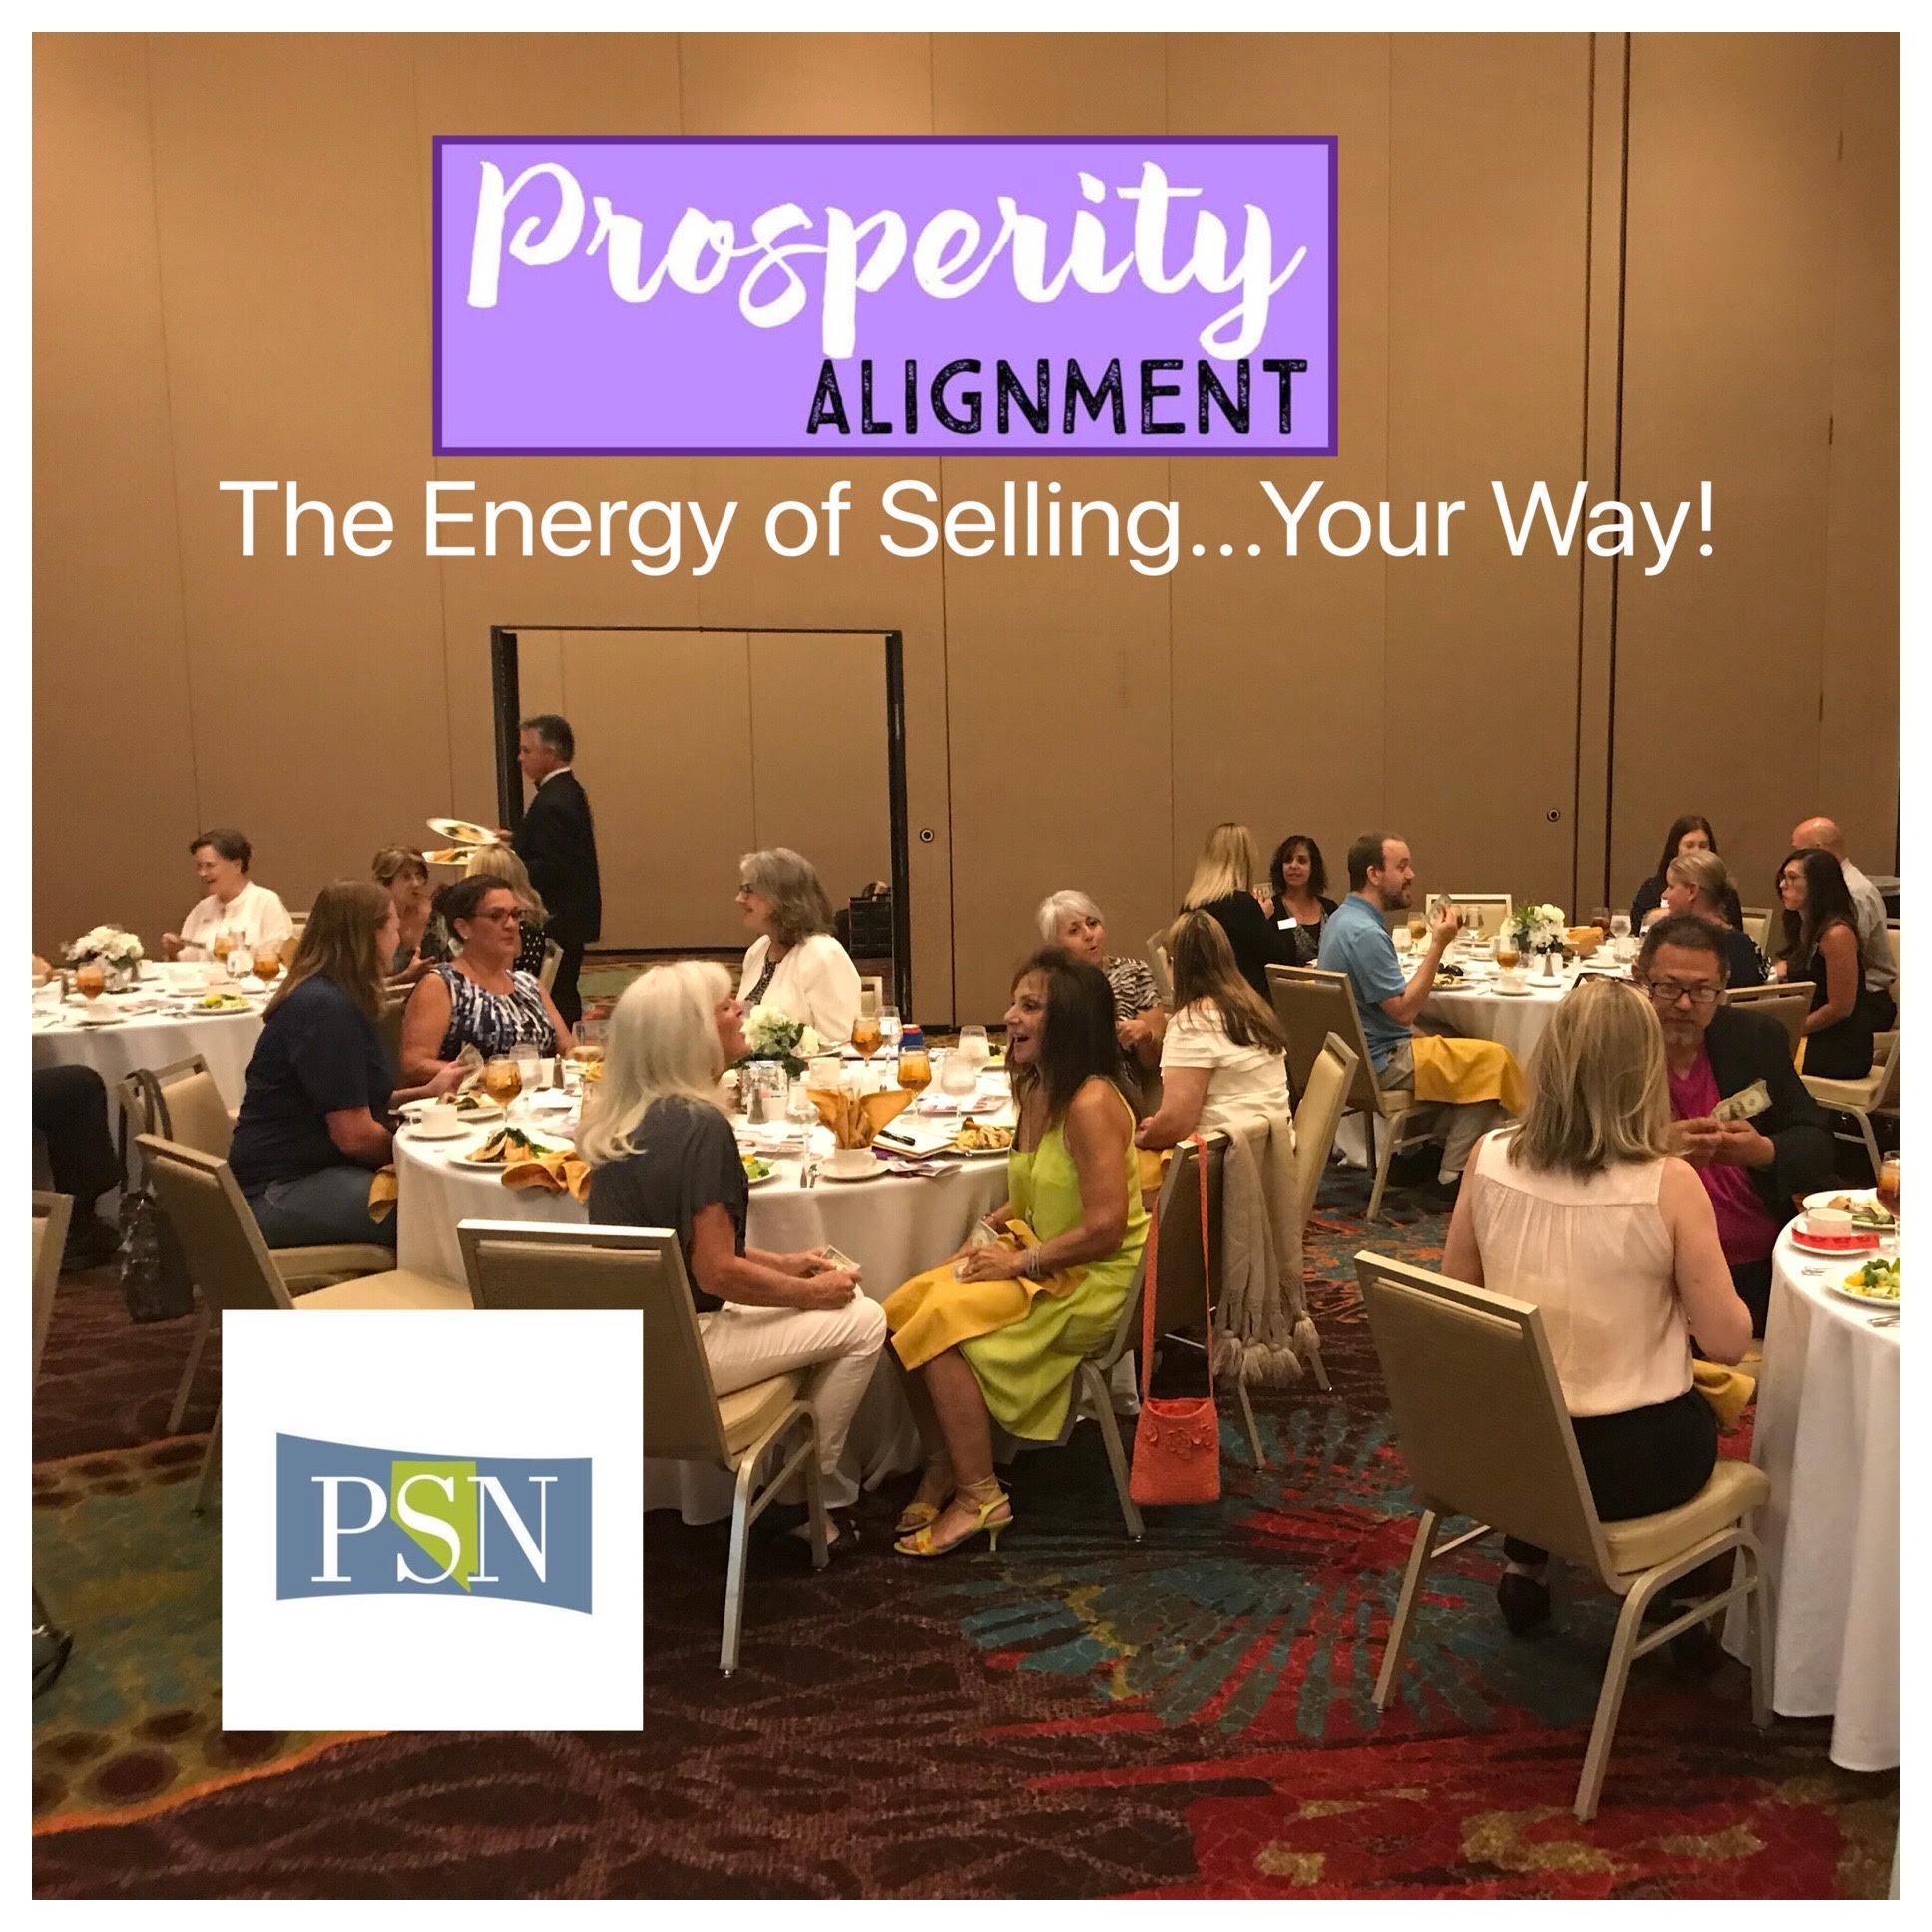 PSN Event pic 19-08-13.jpg